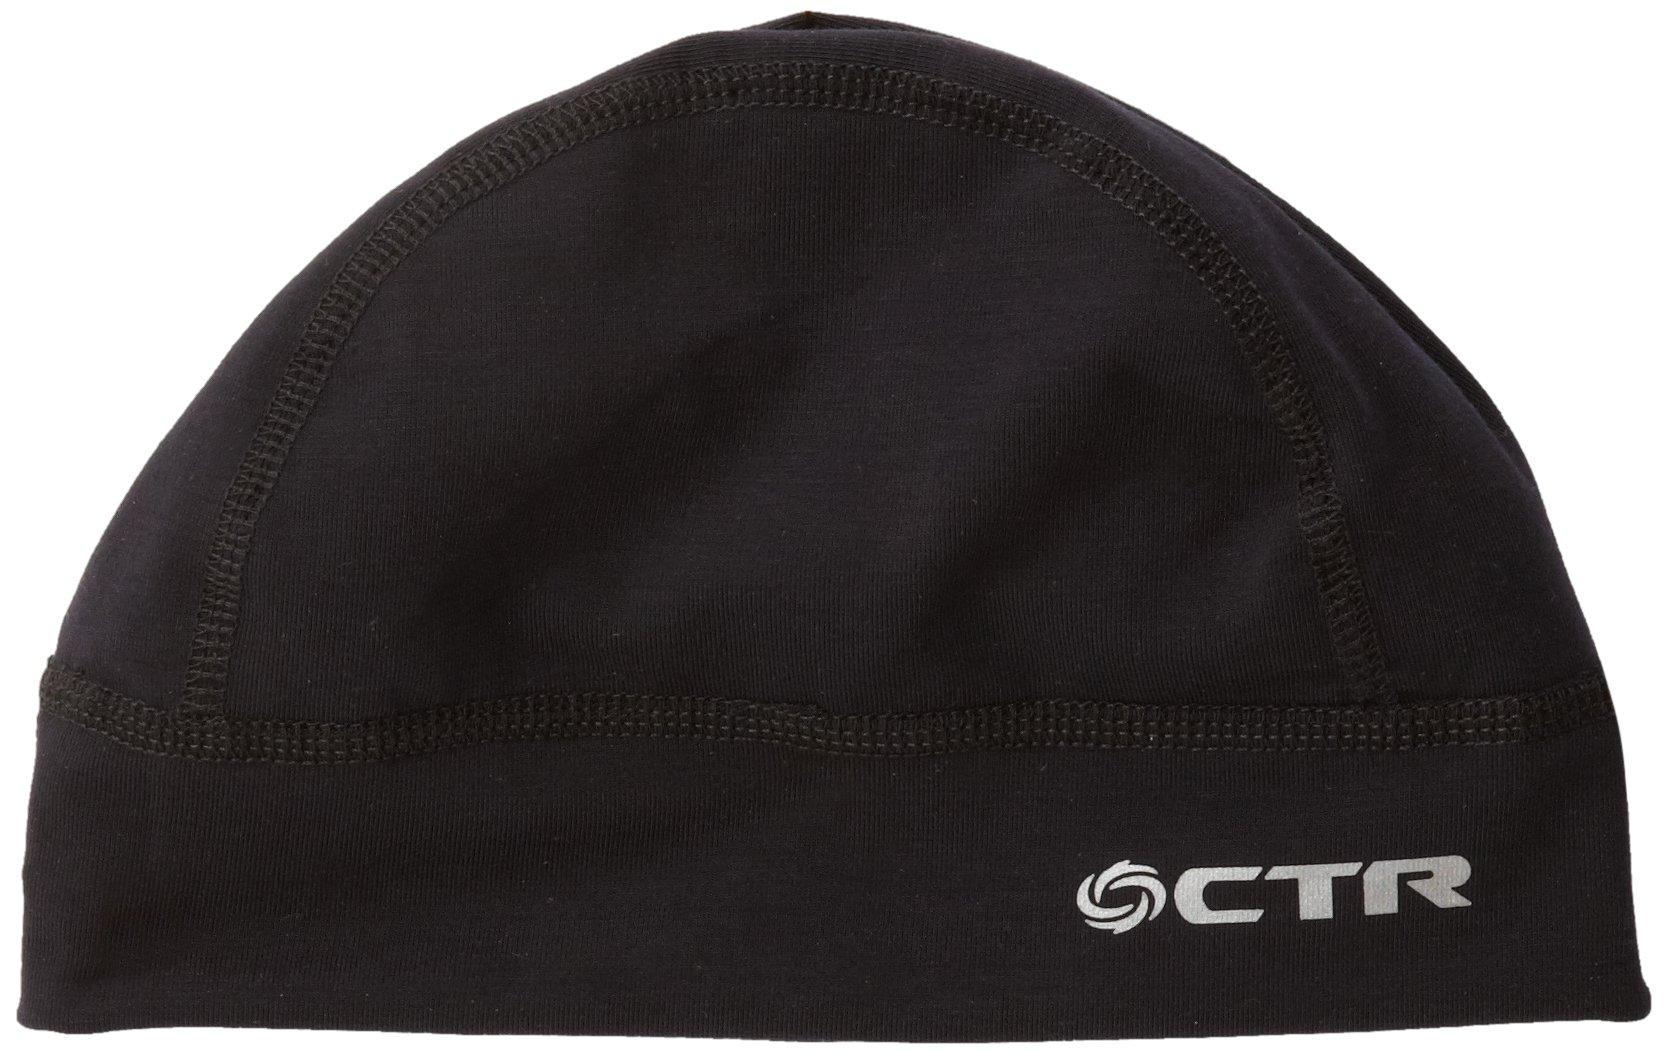 Chaos CTR Adrenaline Skull Cap and Helmet Liner, Black, Junior